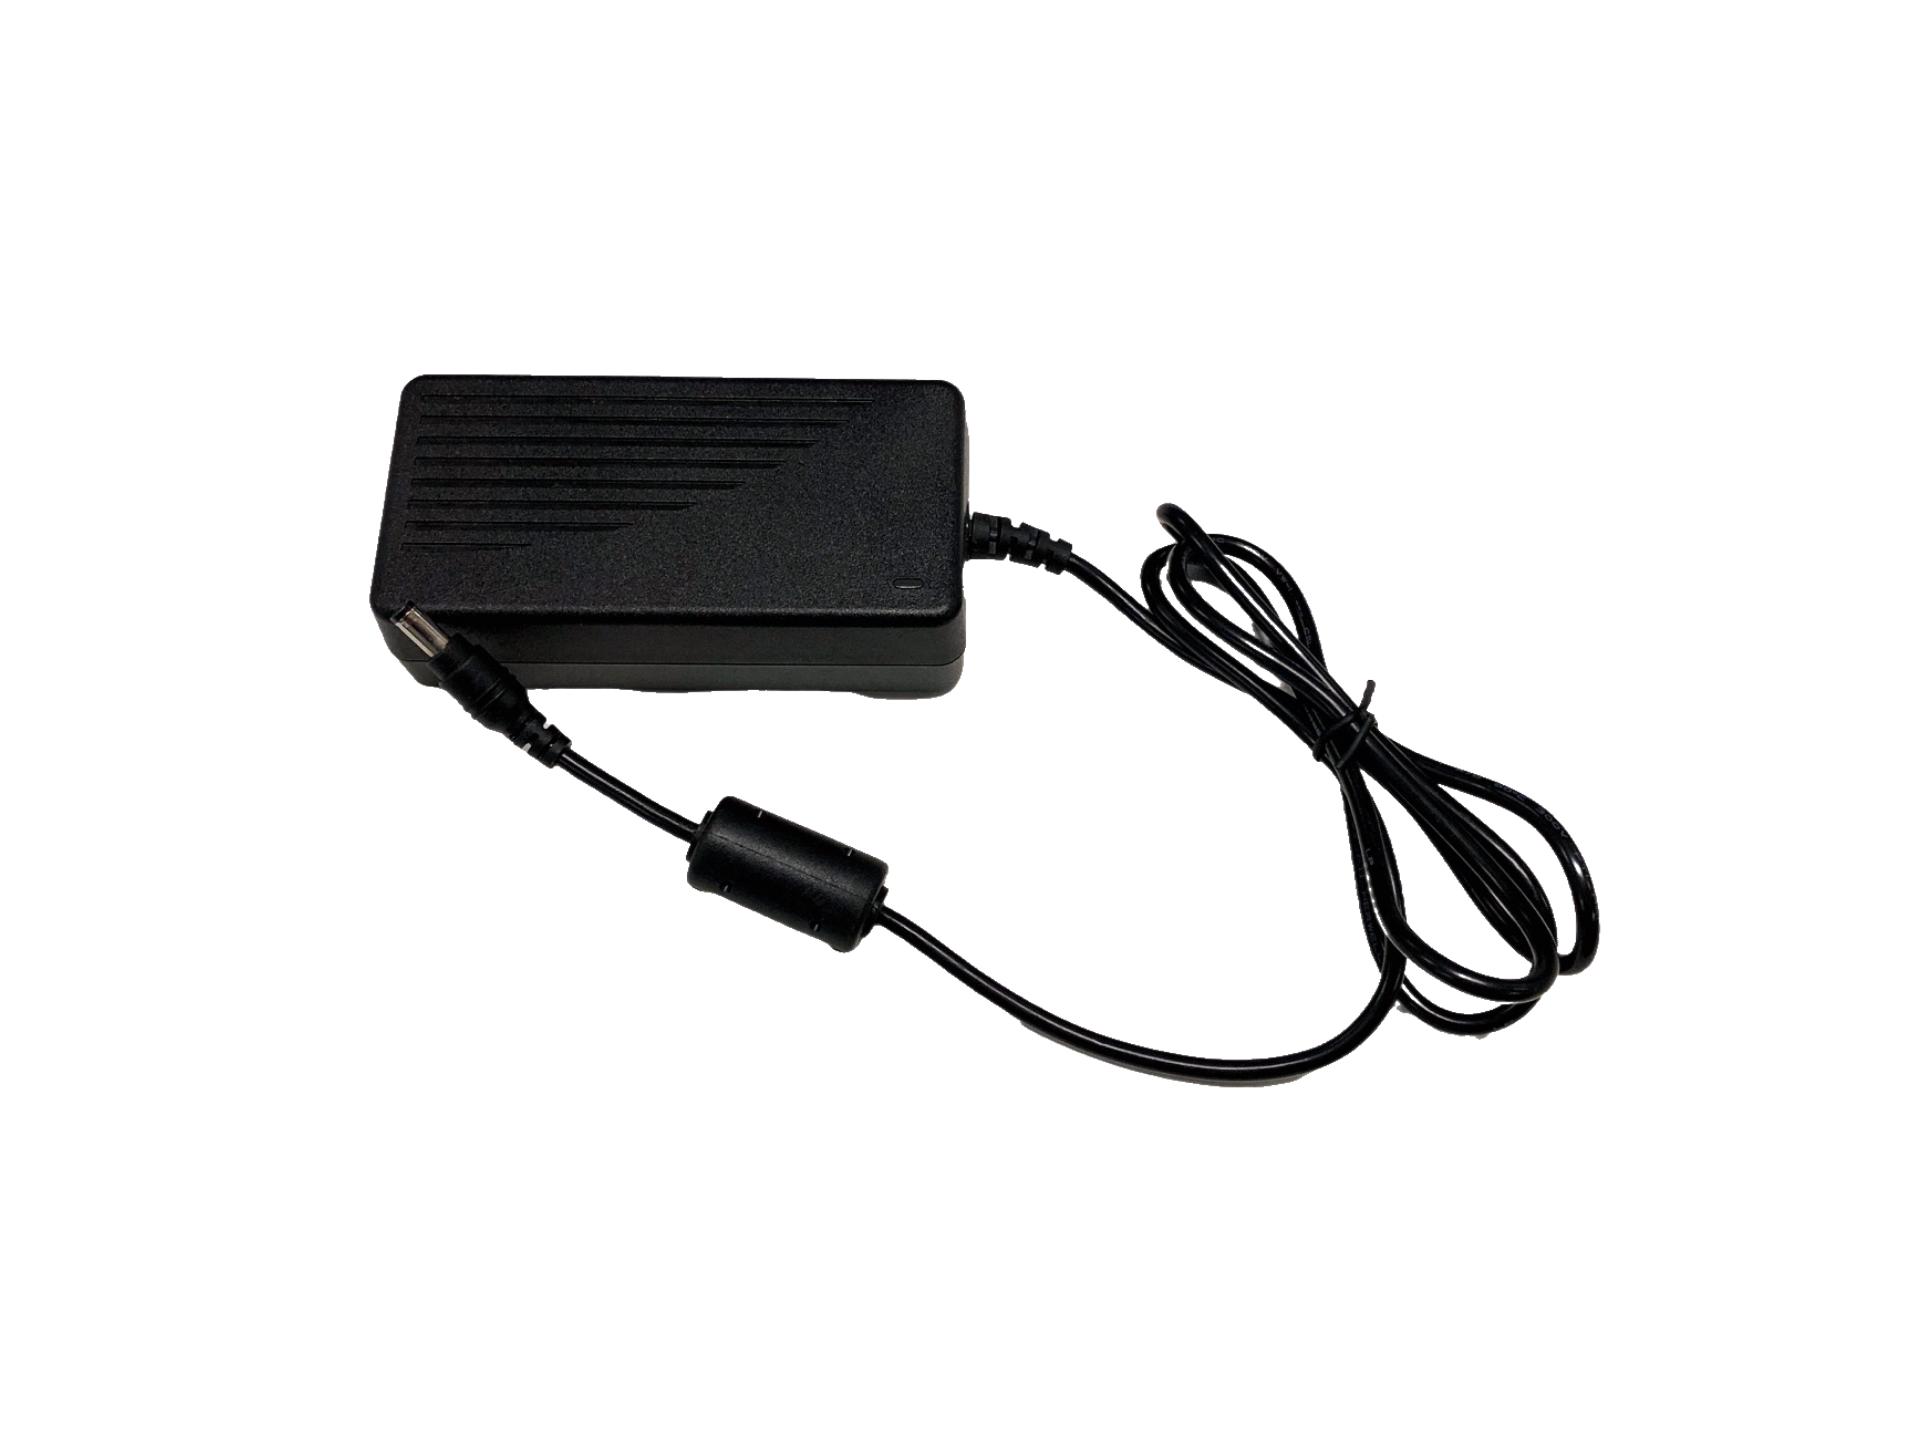 XT终端/HC摄像机电源适配器